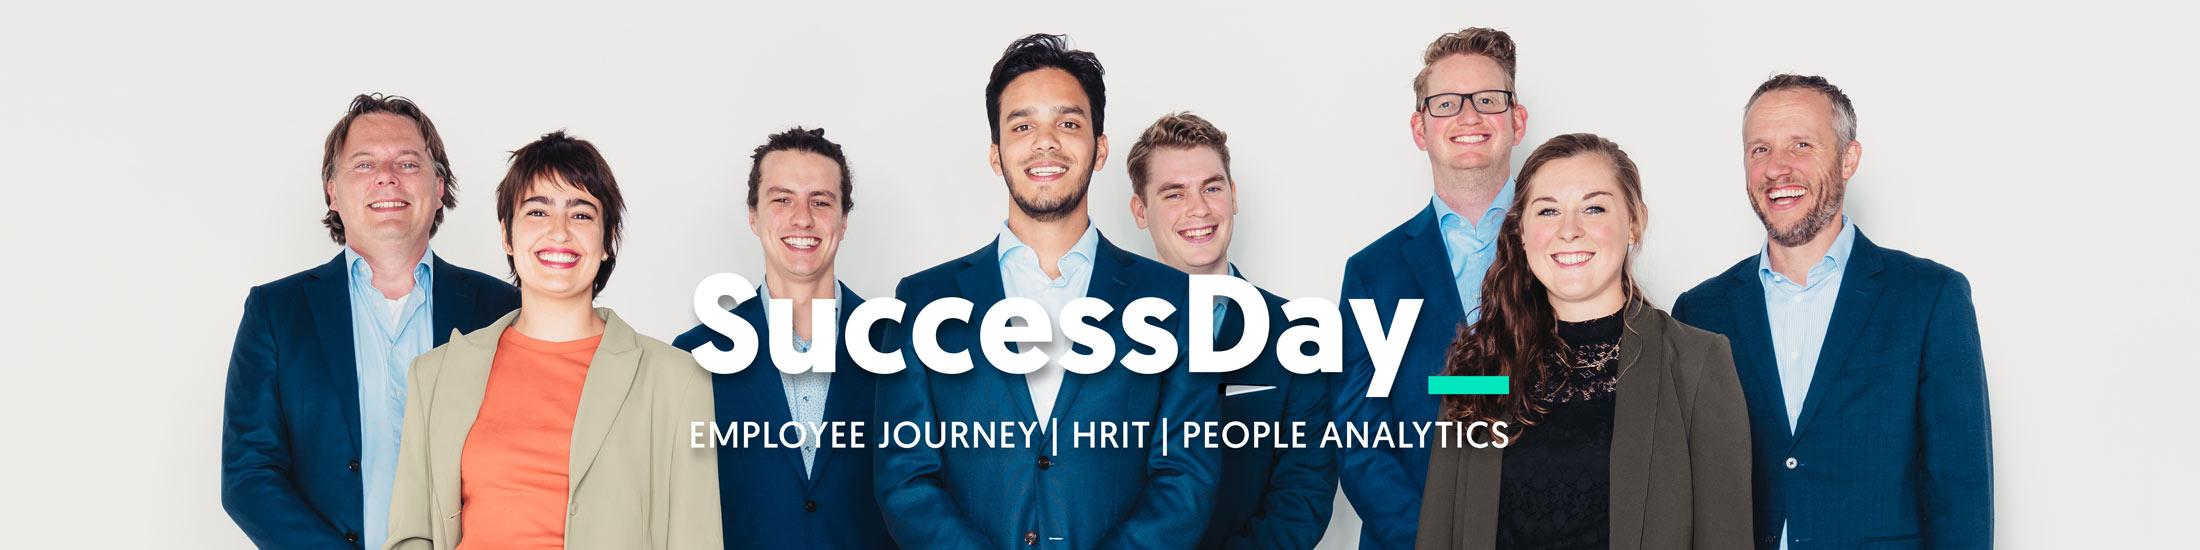 SuccessDay - corporate identity